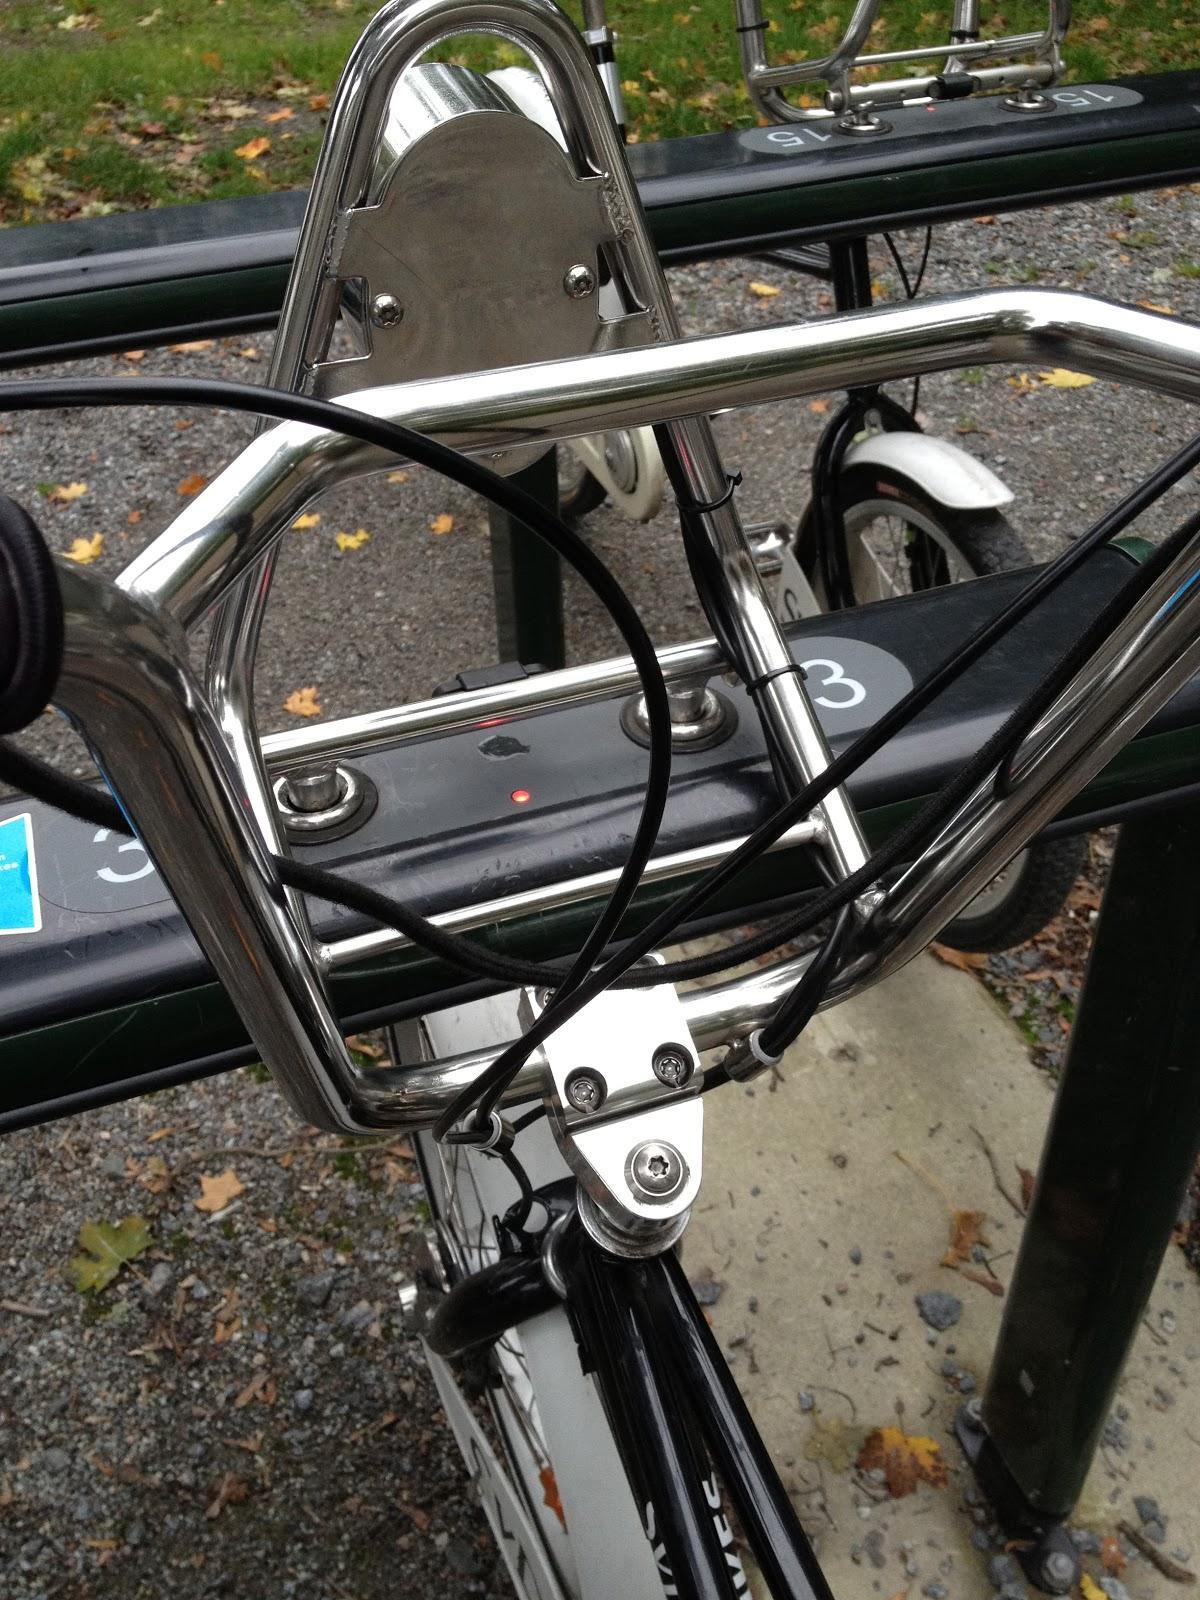 metal basket connects bike to bike stand